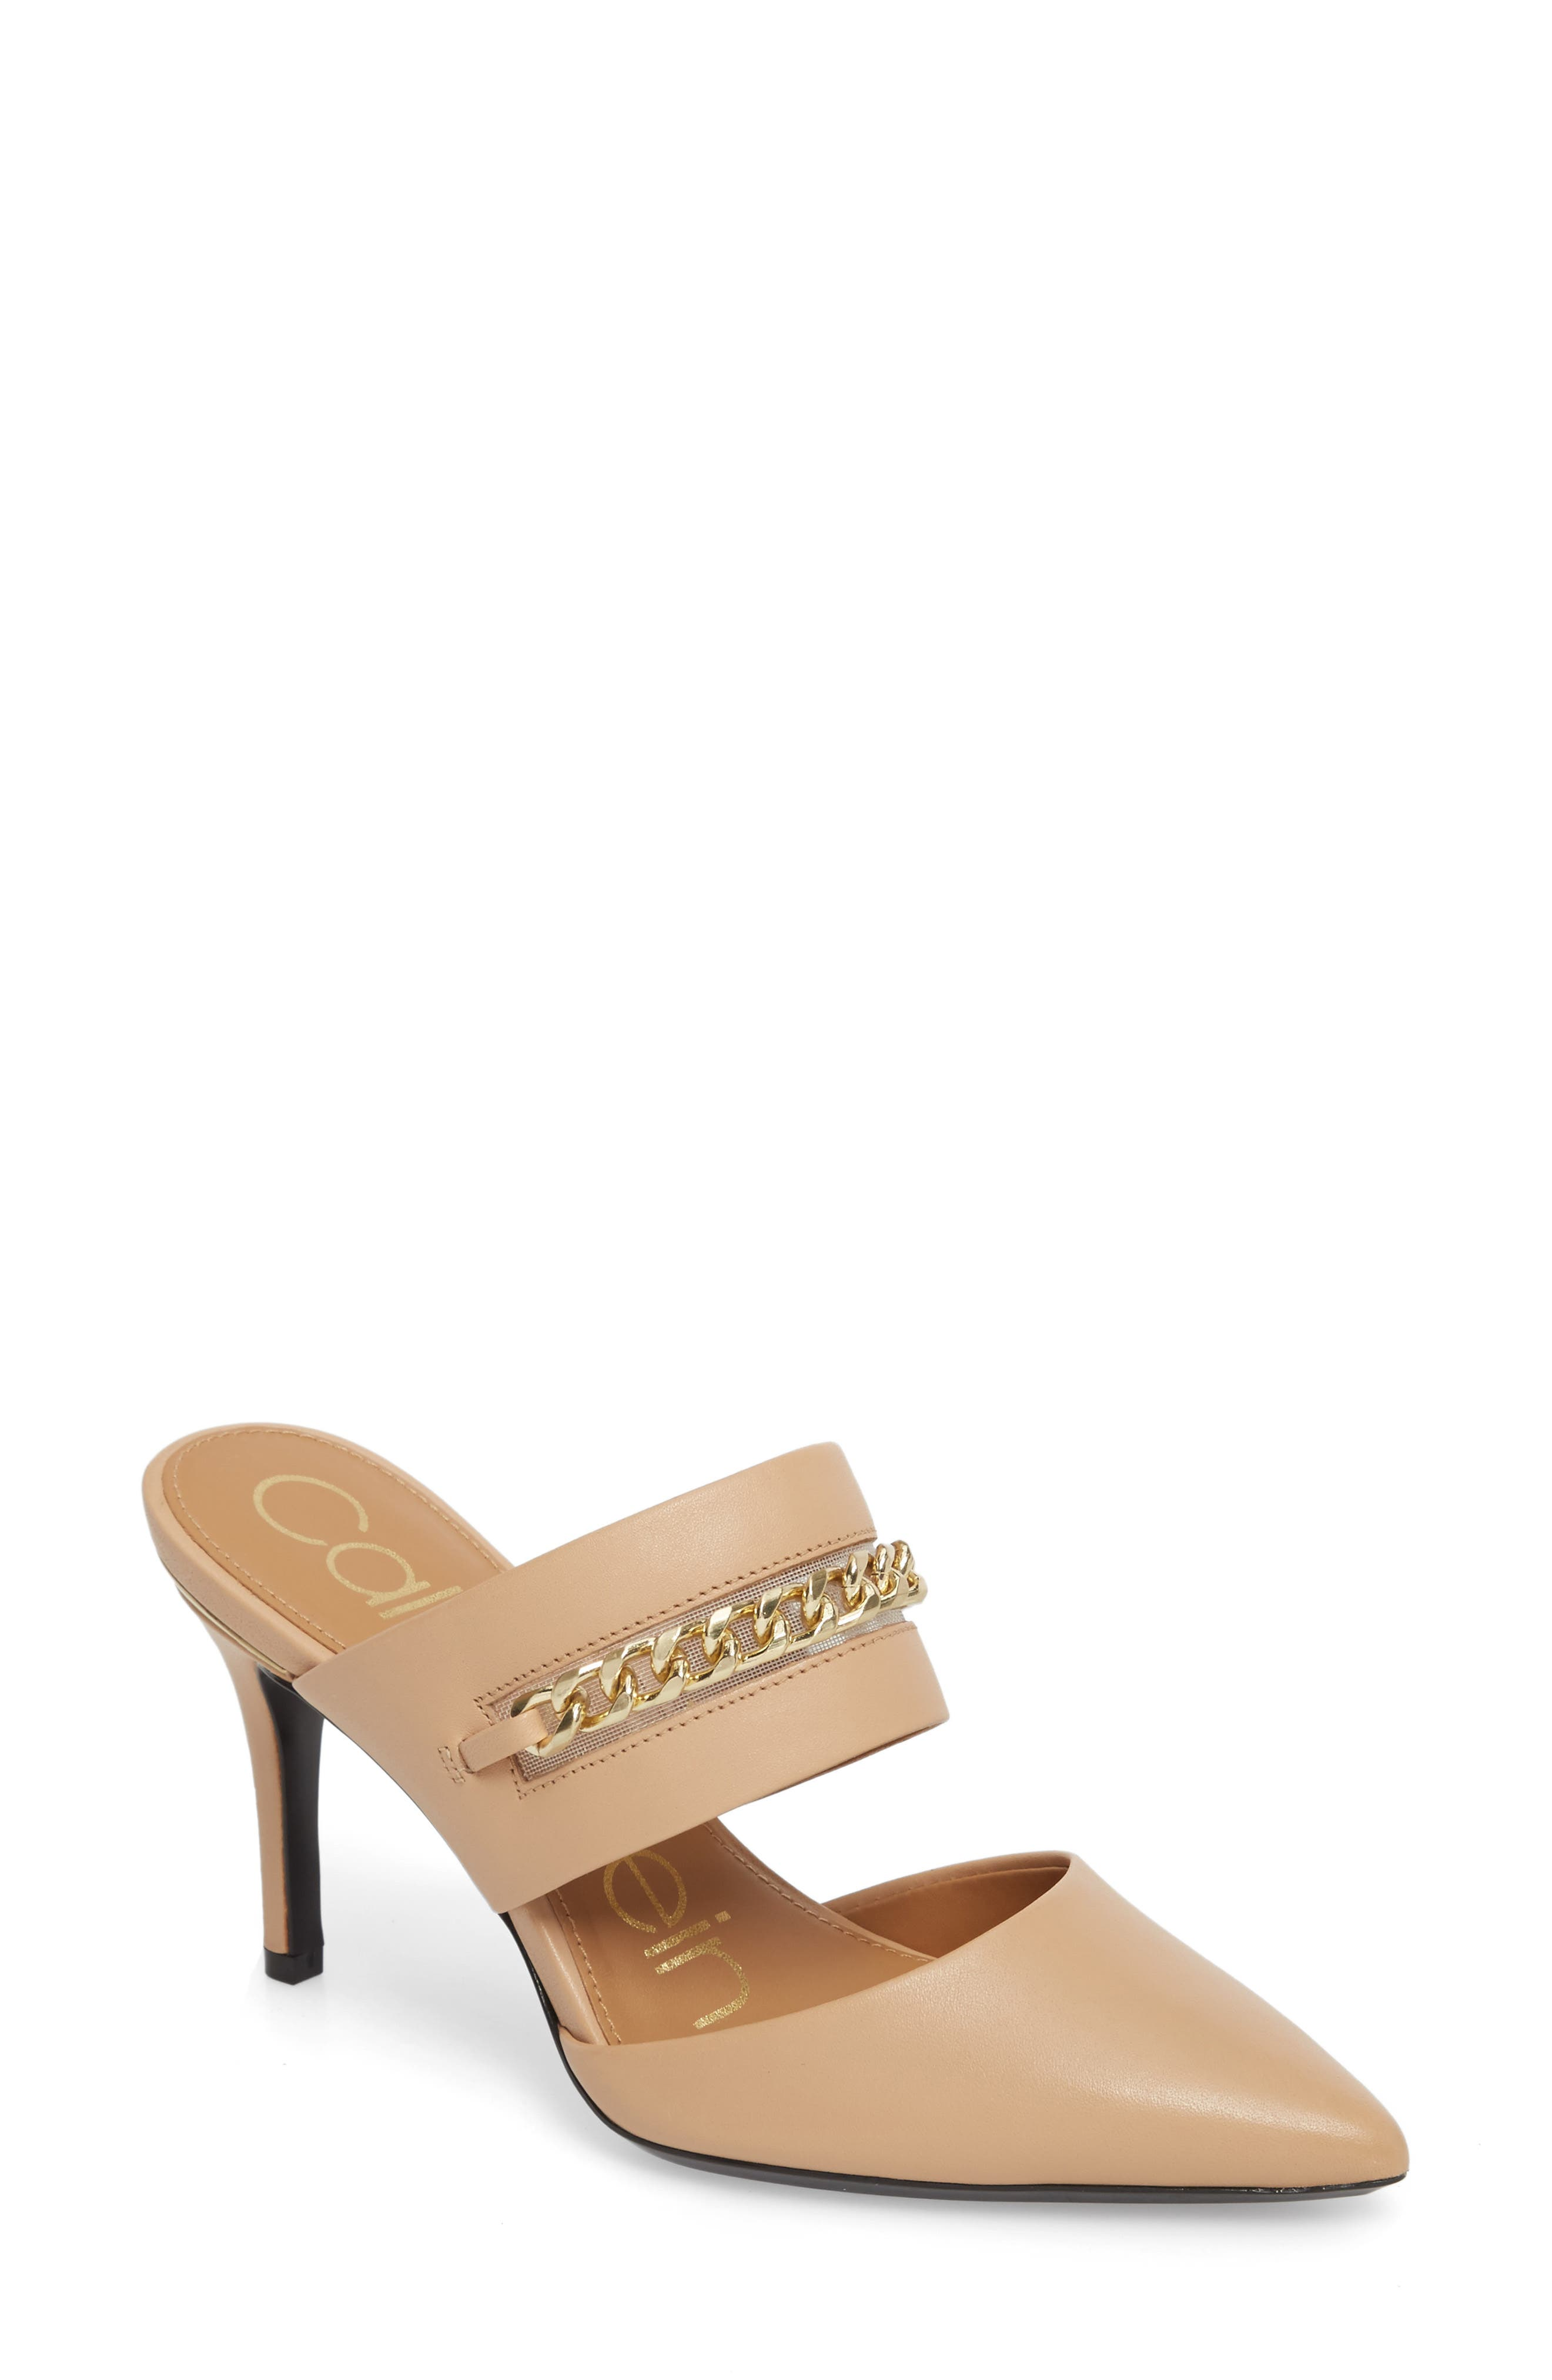 Ginette Embellished Pointy Toe Mule,                         Main,                         color, Sandstorm Leather